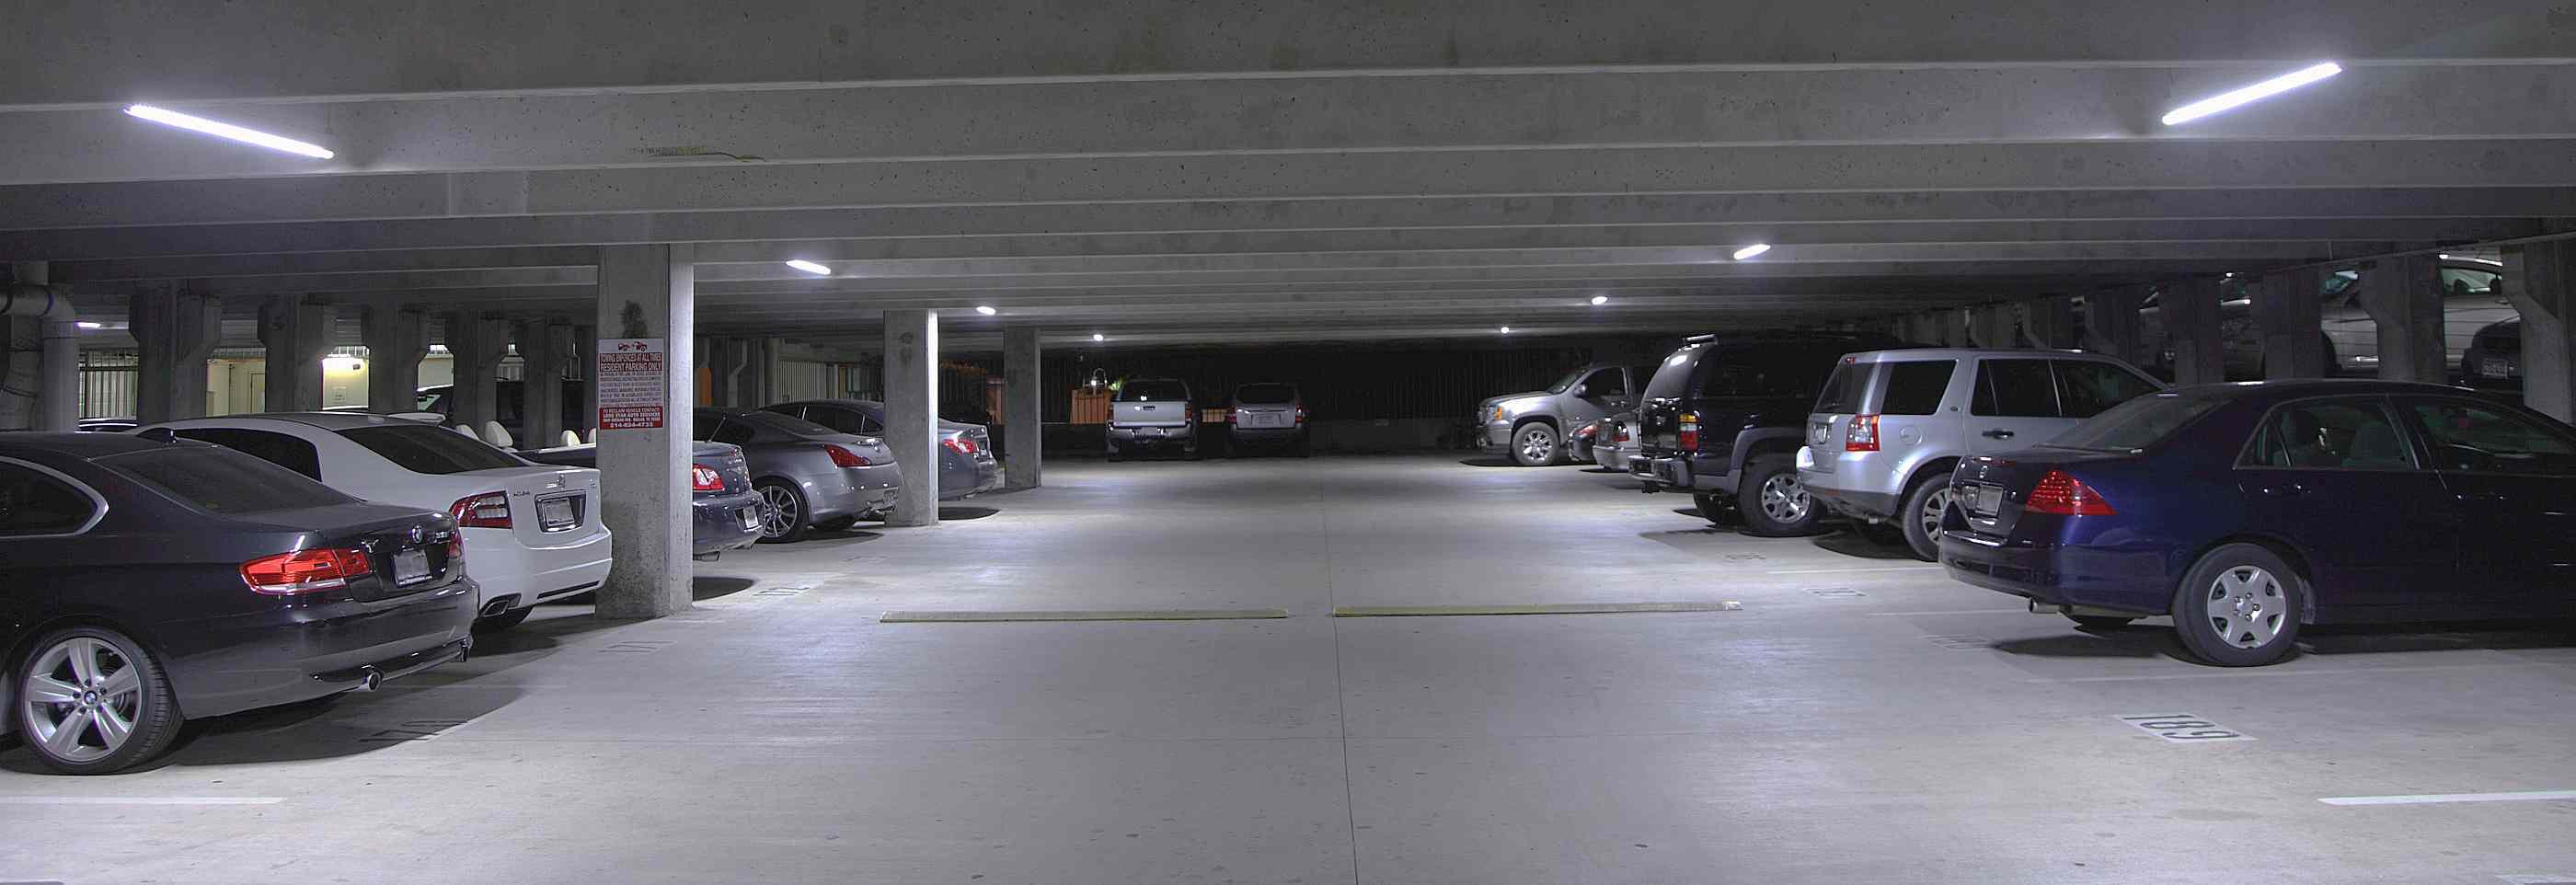 Led Lighting For Parking Garages Improving Safety And